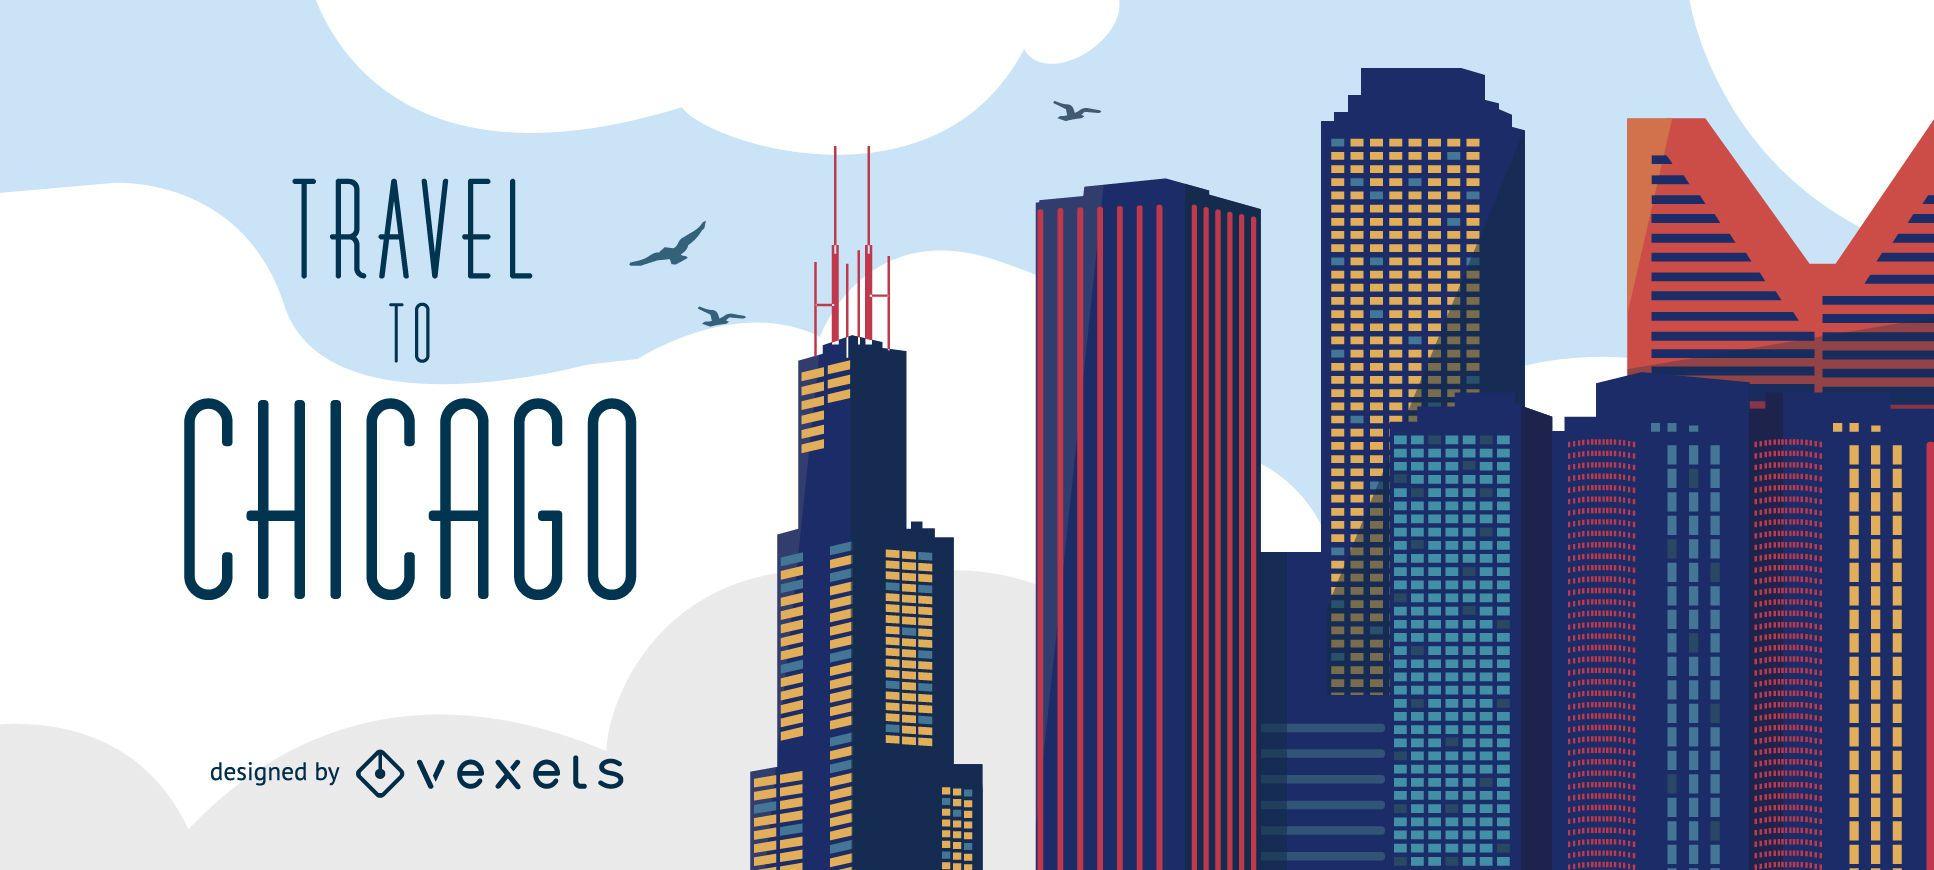 Travel to Chicago skyline